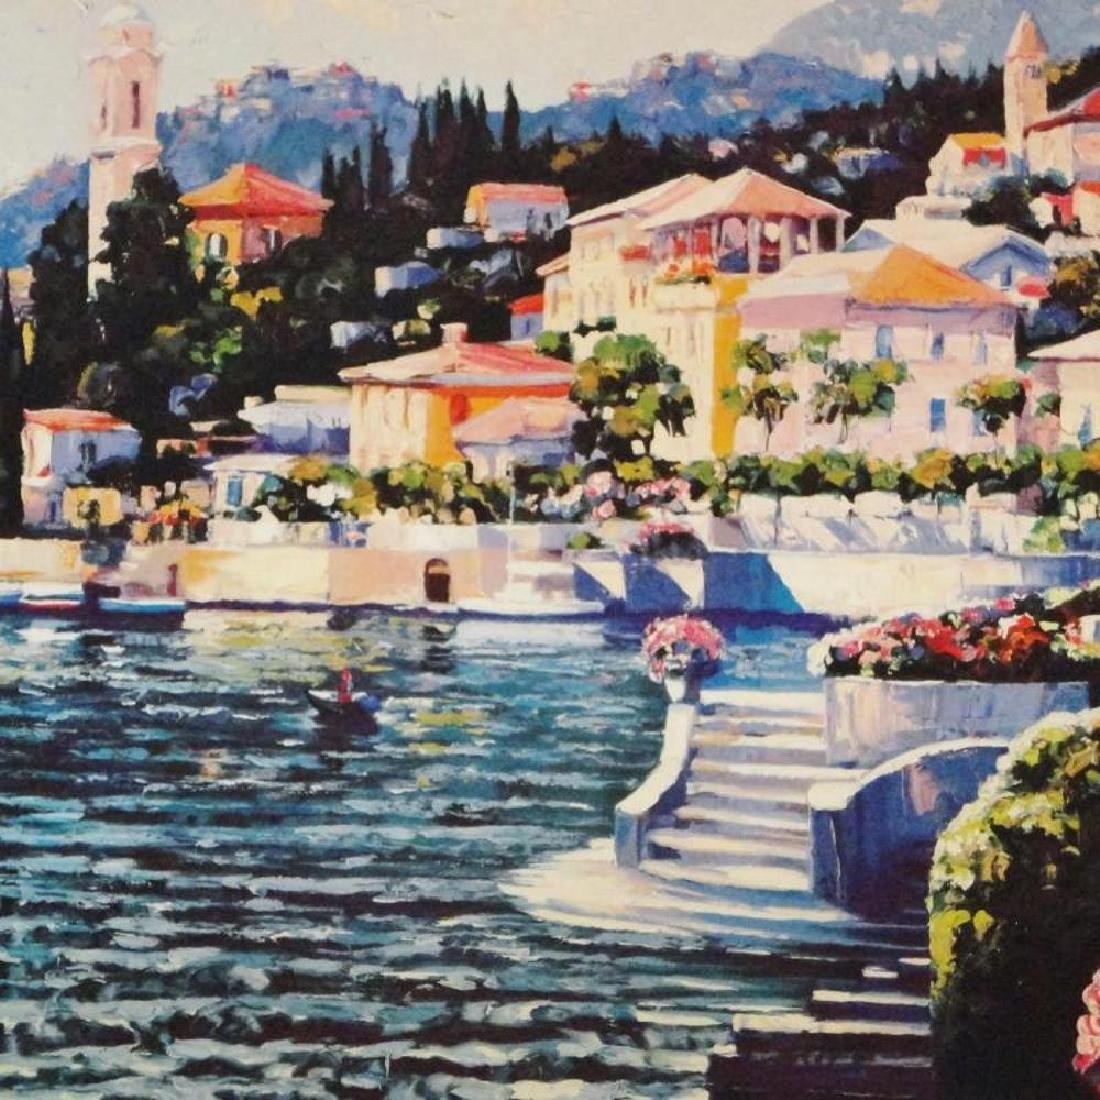 Howard Behrens Colorful Art Print Lake Como Sale - 3